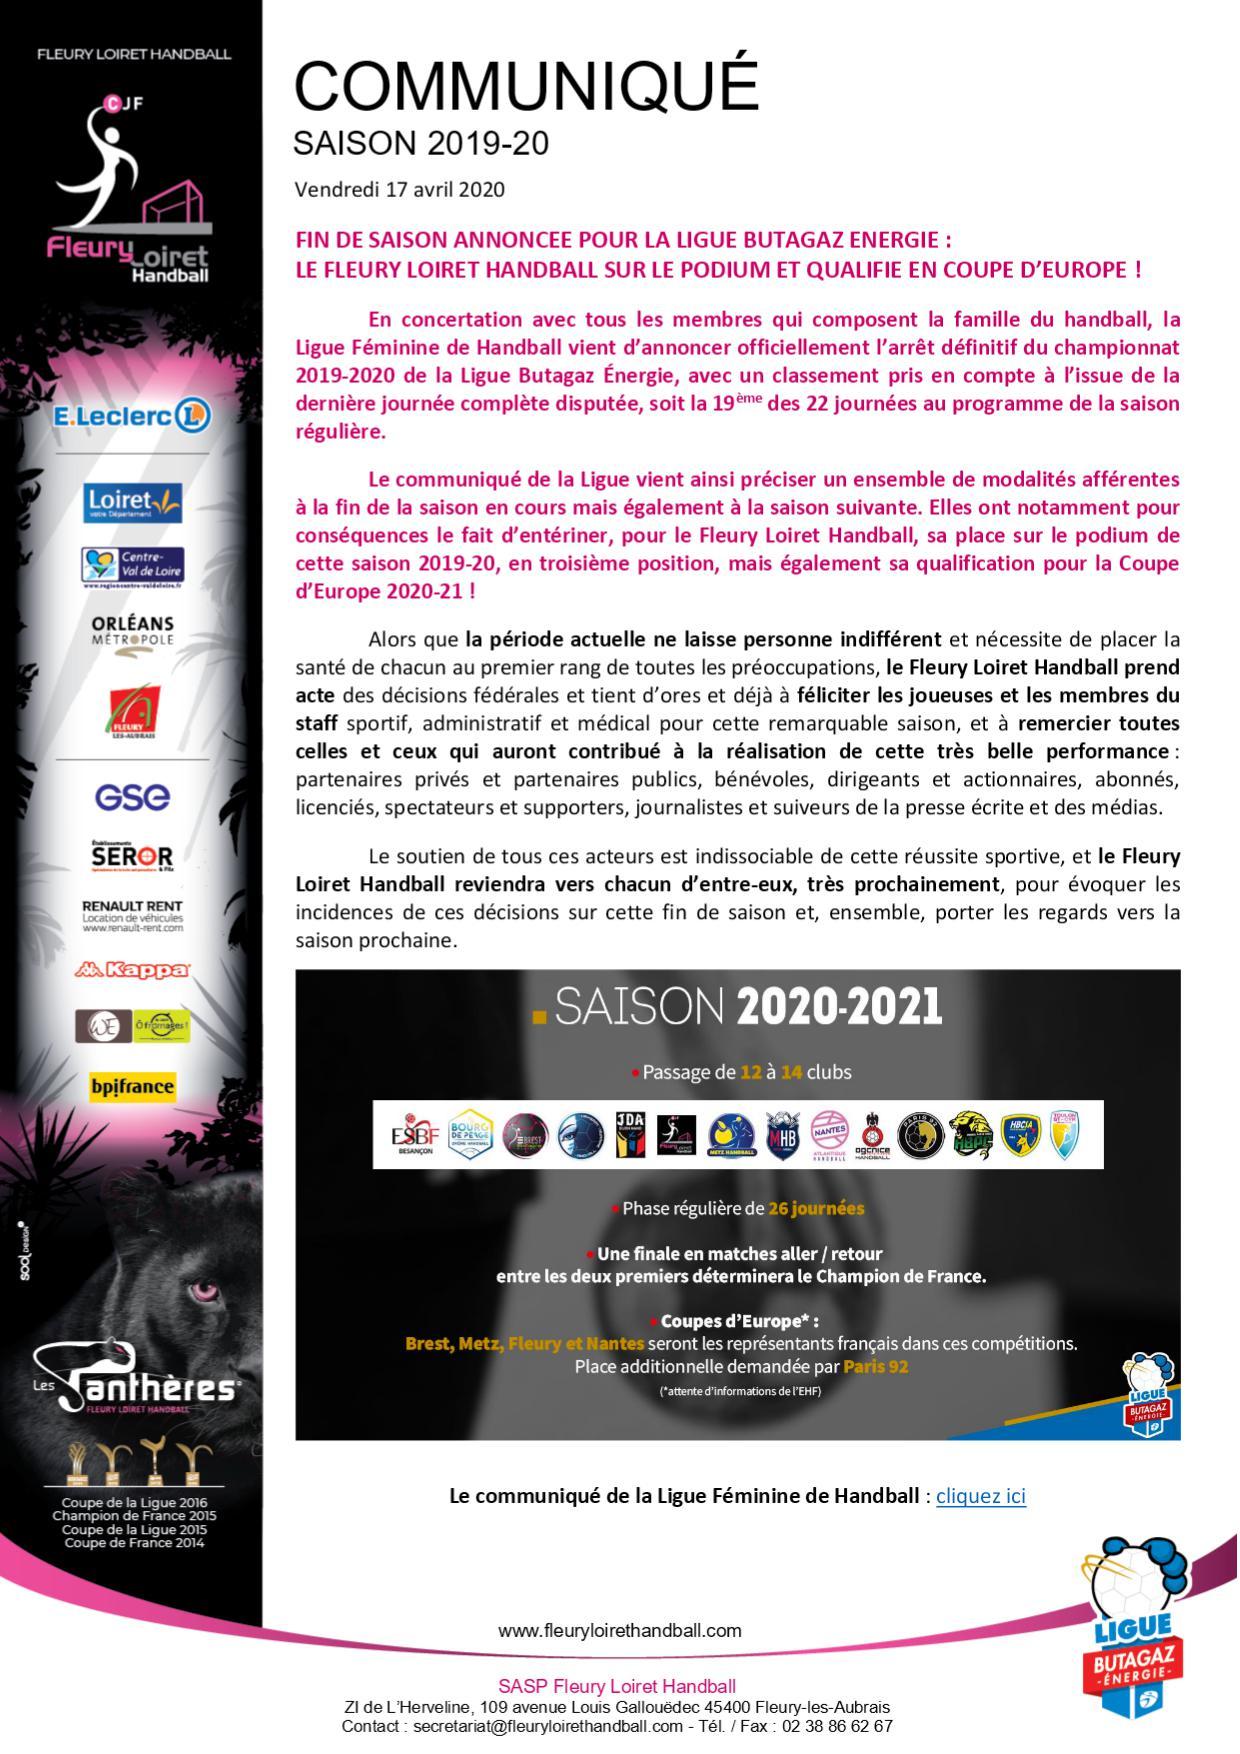 Aout 2015 - Communiqué Fleury Loiret Handball - Vendredi 17 avril 2020.jpg